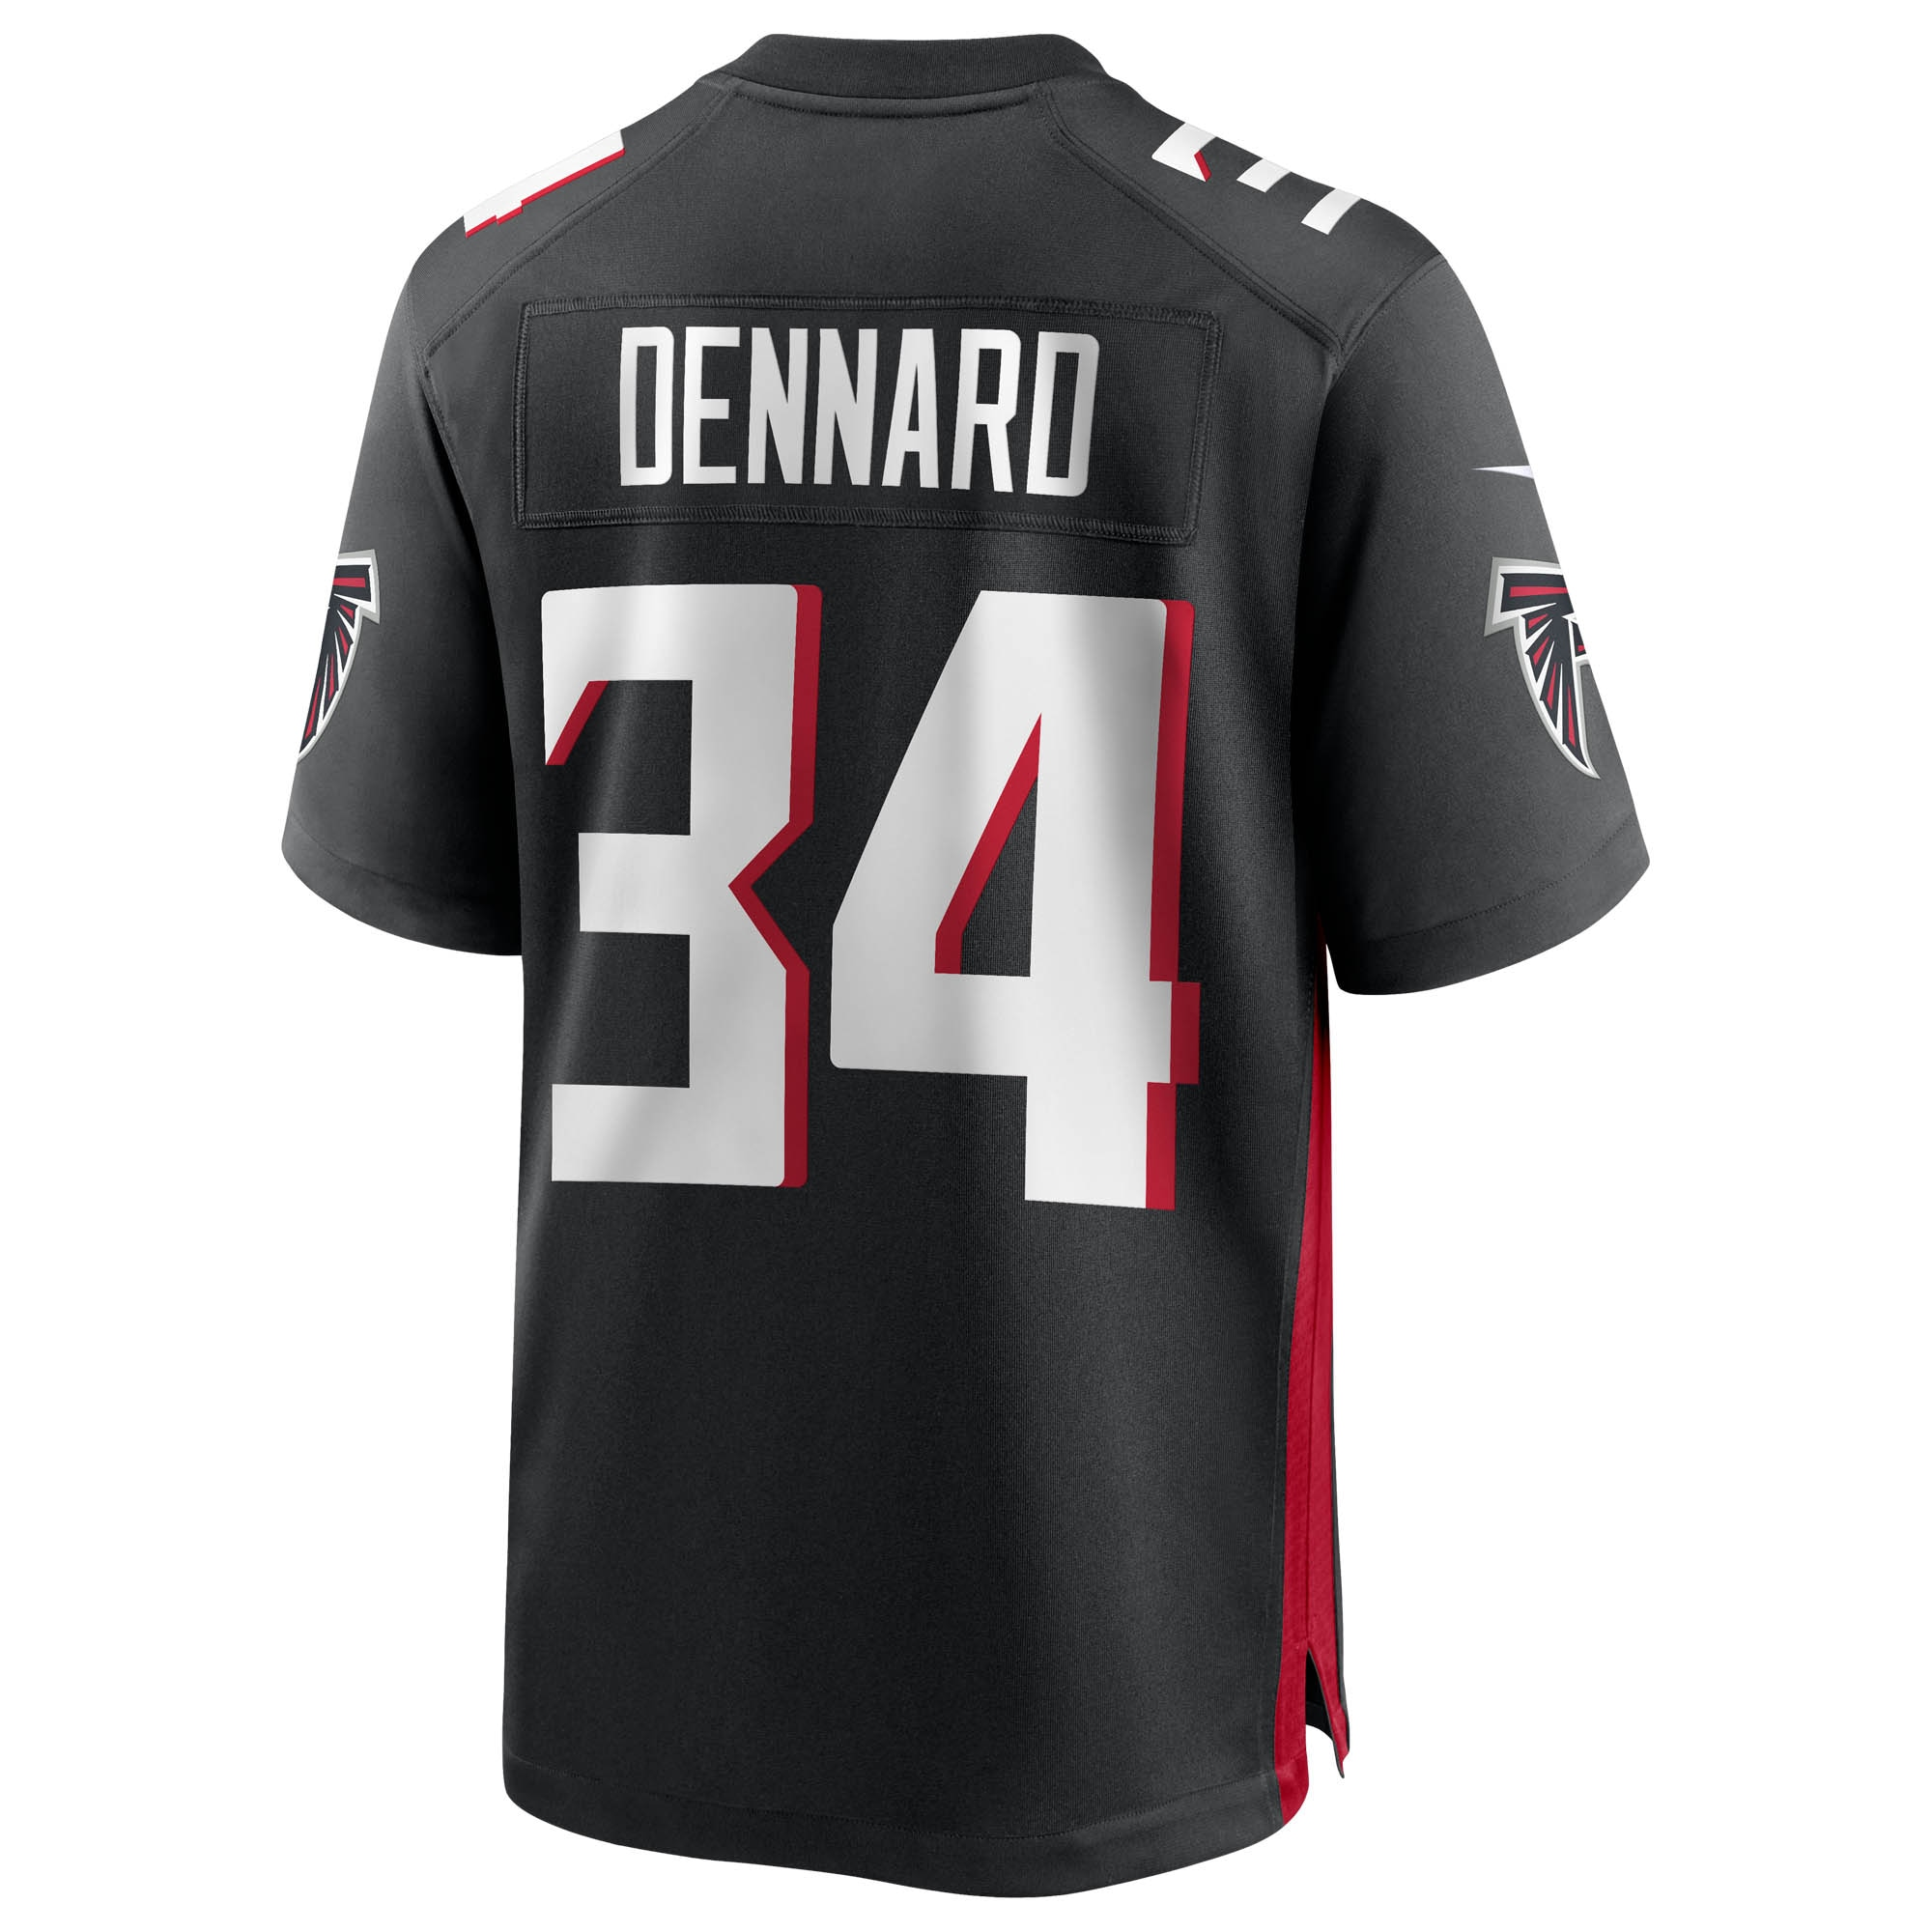 Darqueze Dennard Atlanta Falcons Nike Game Jersey - Black